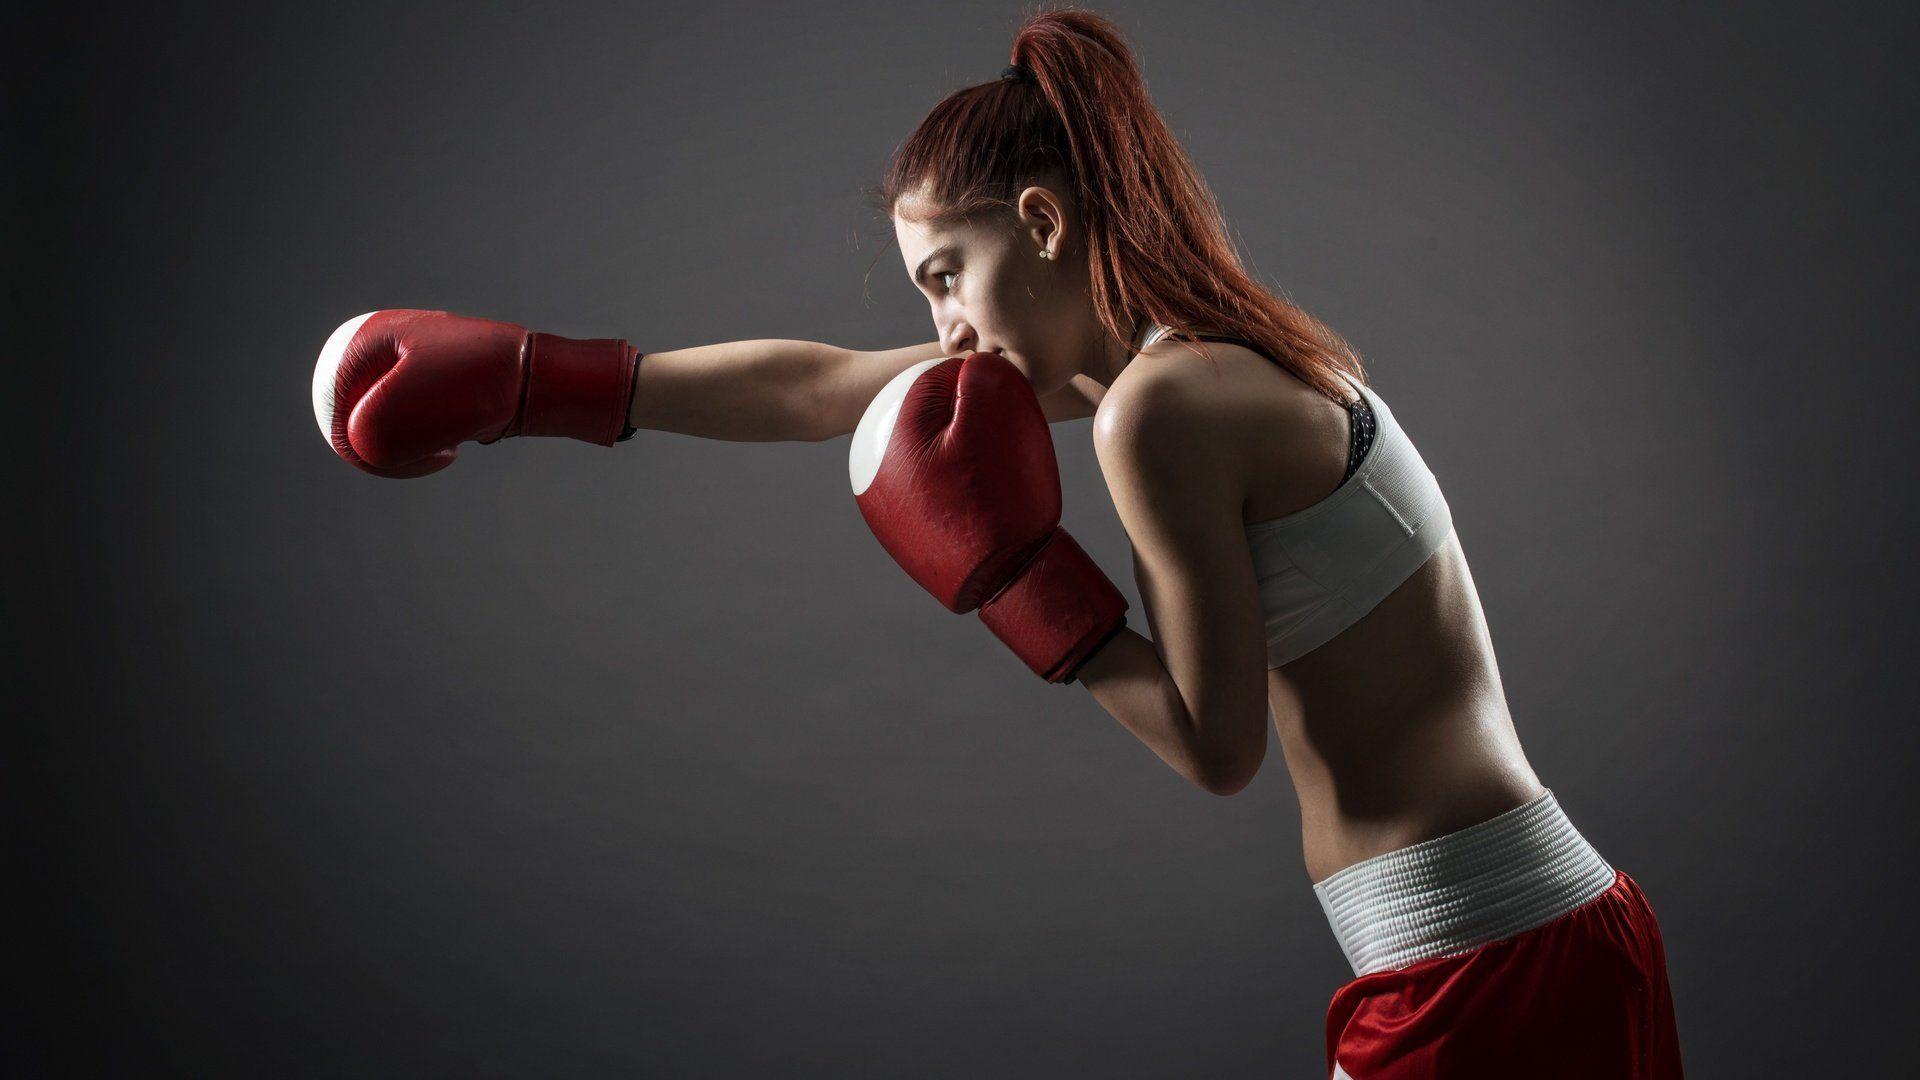 Boxing vertical wallpaper hd